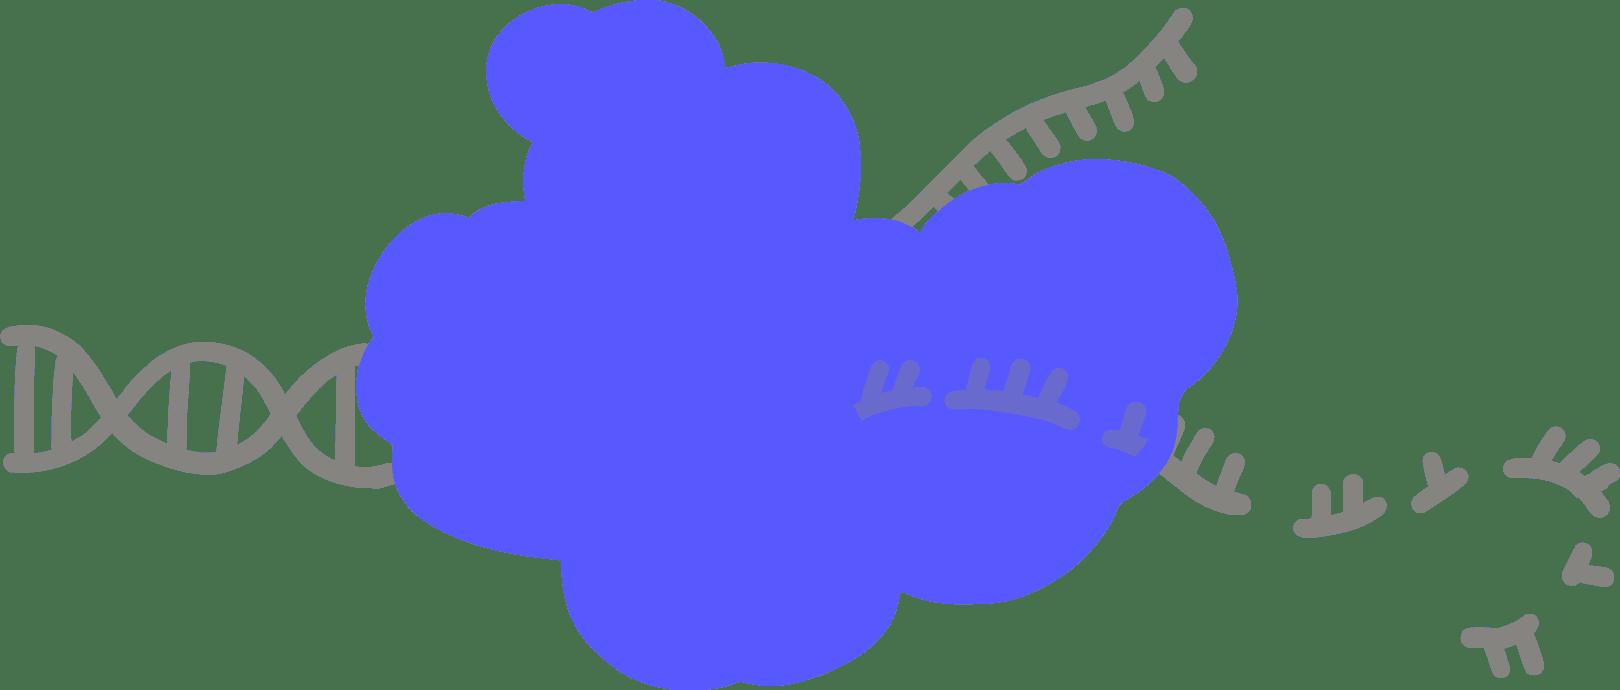 Illustration of Cas3